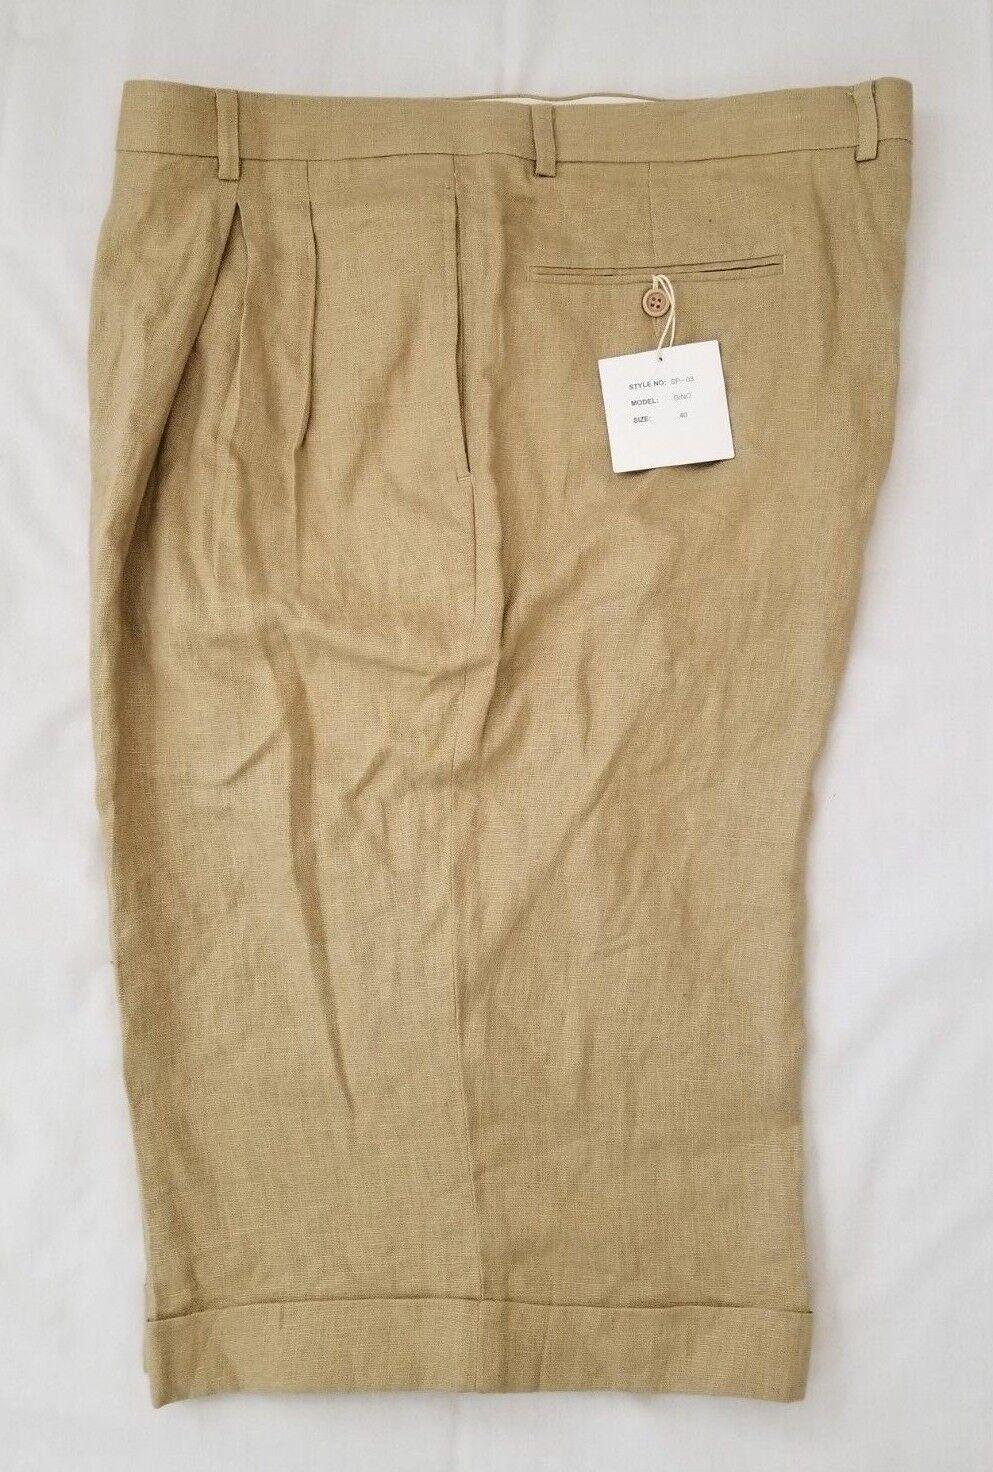 16249ae89 Size 40 Maximus 100% Linen Cuffed Casual Shorts Mens Beige nwrzwt19682- Shorts